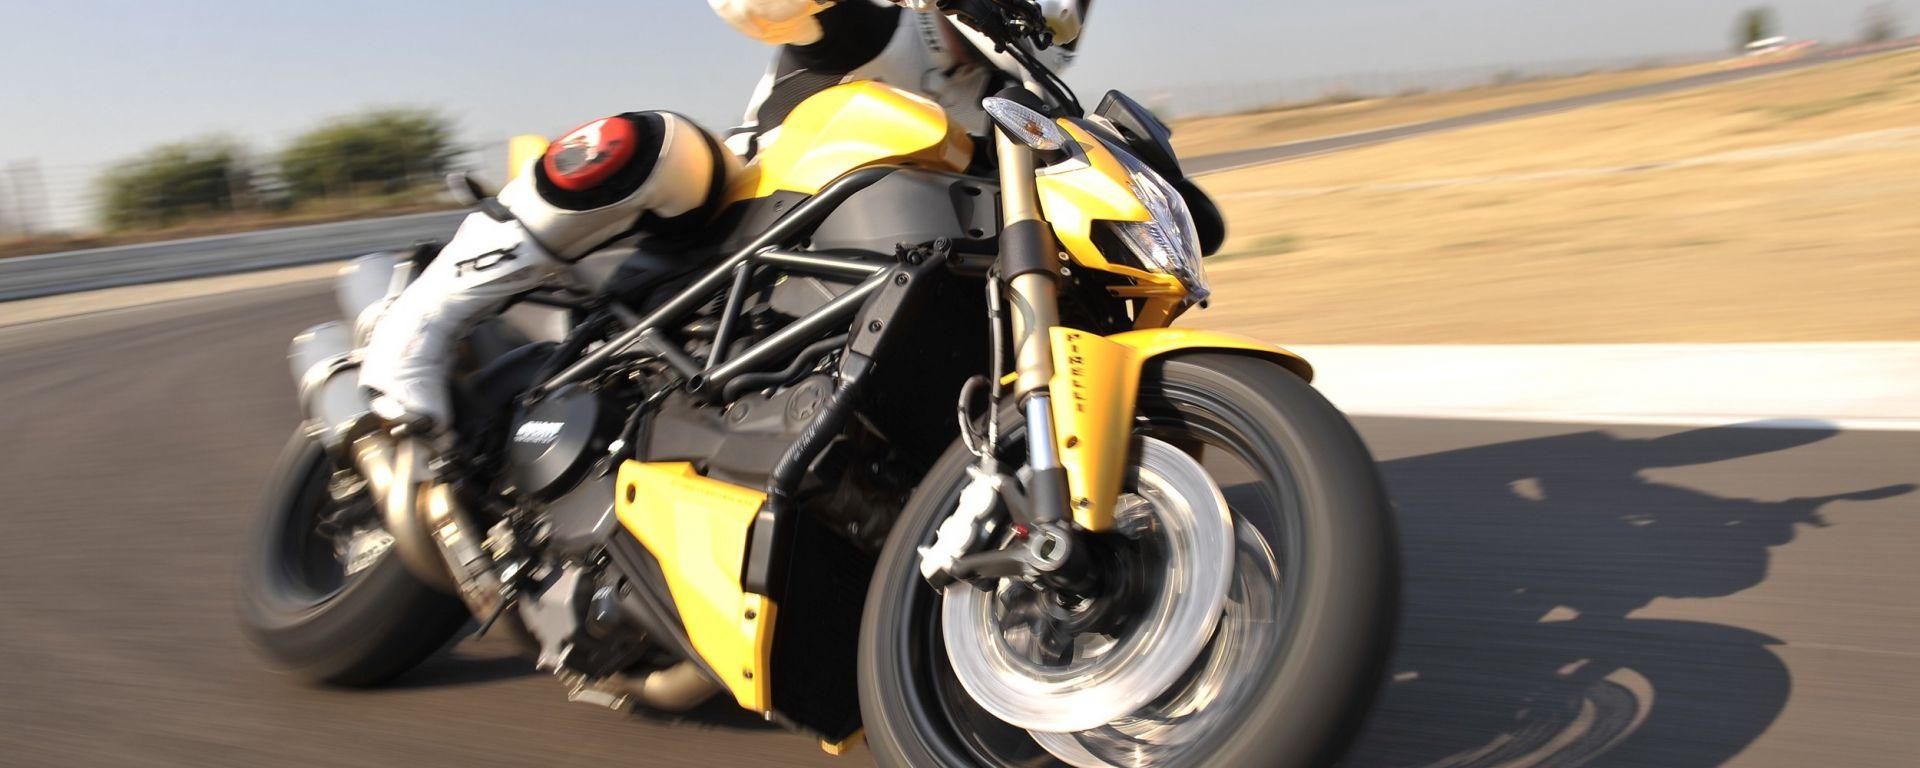 Ducati Streetfighter 848